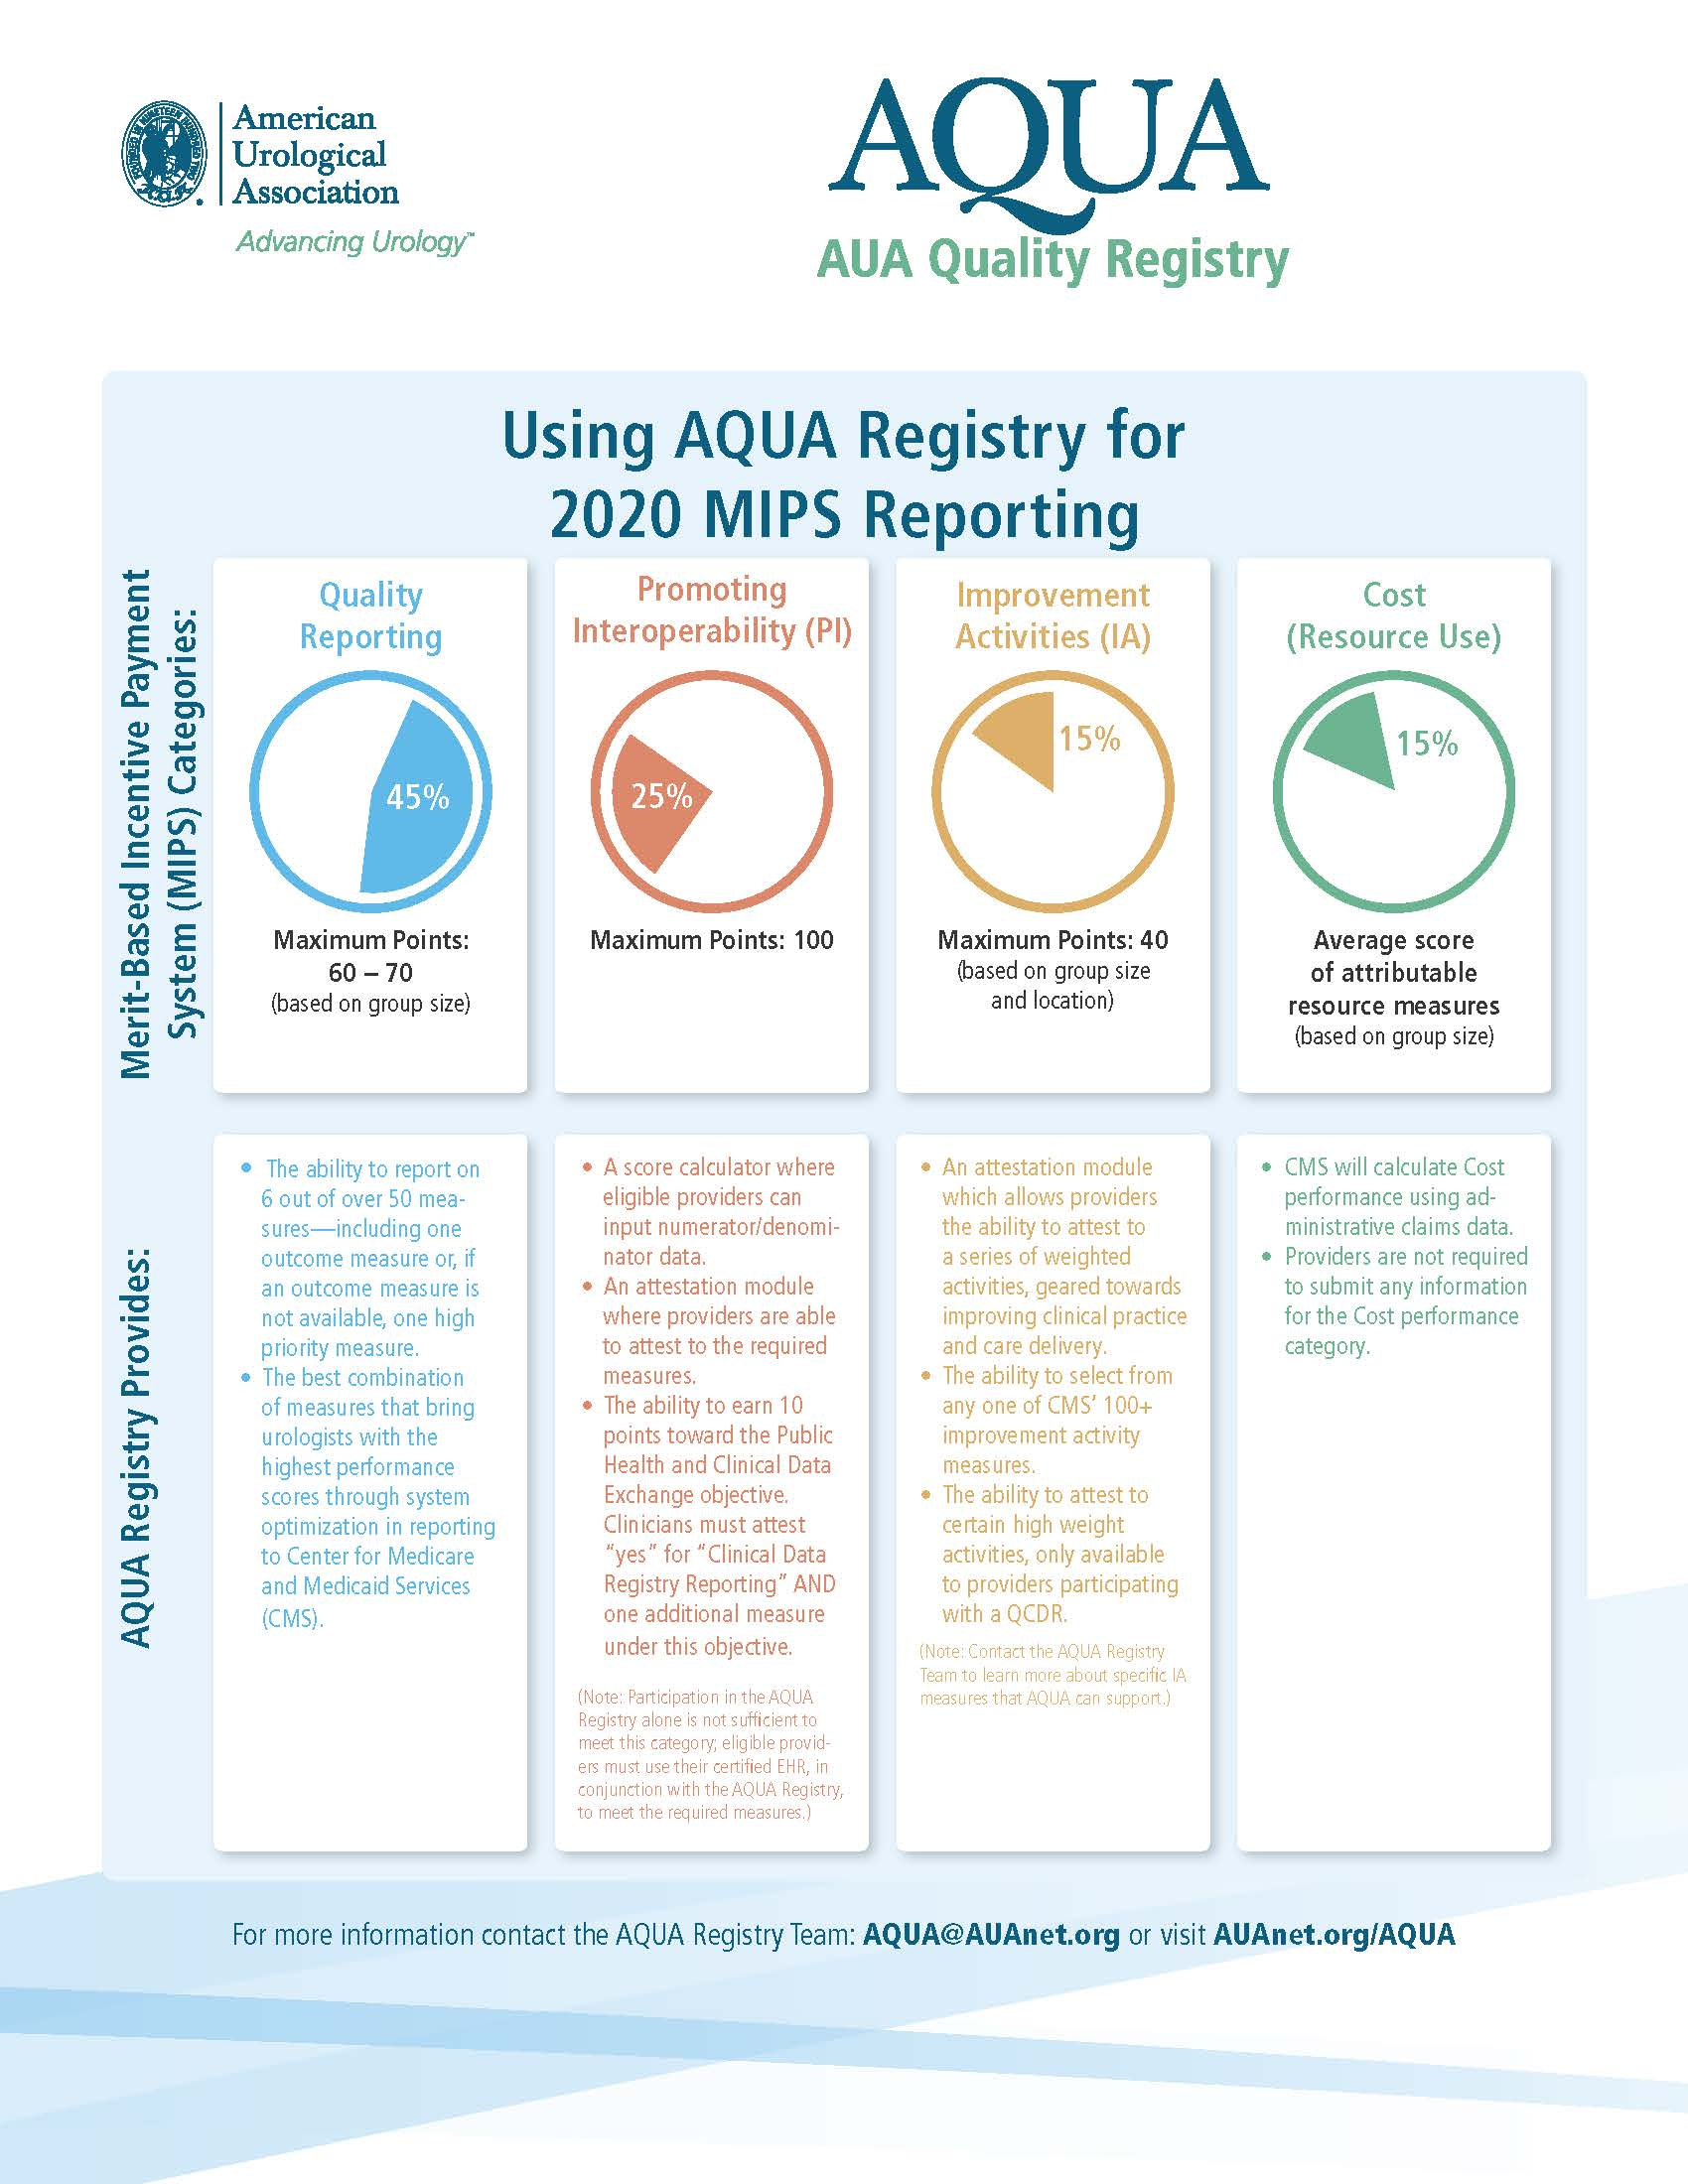 Using the AQUA Registry for MIPS Reporting - American